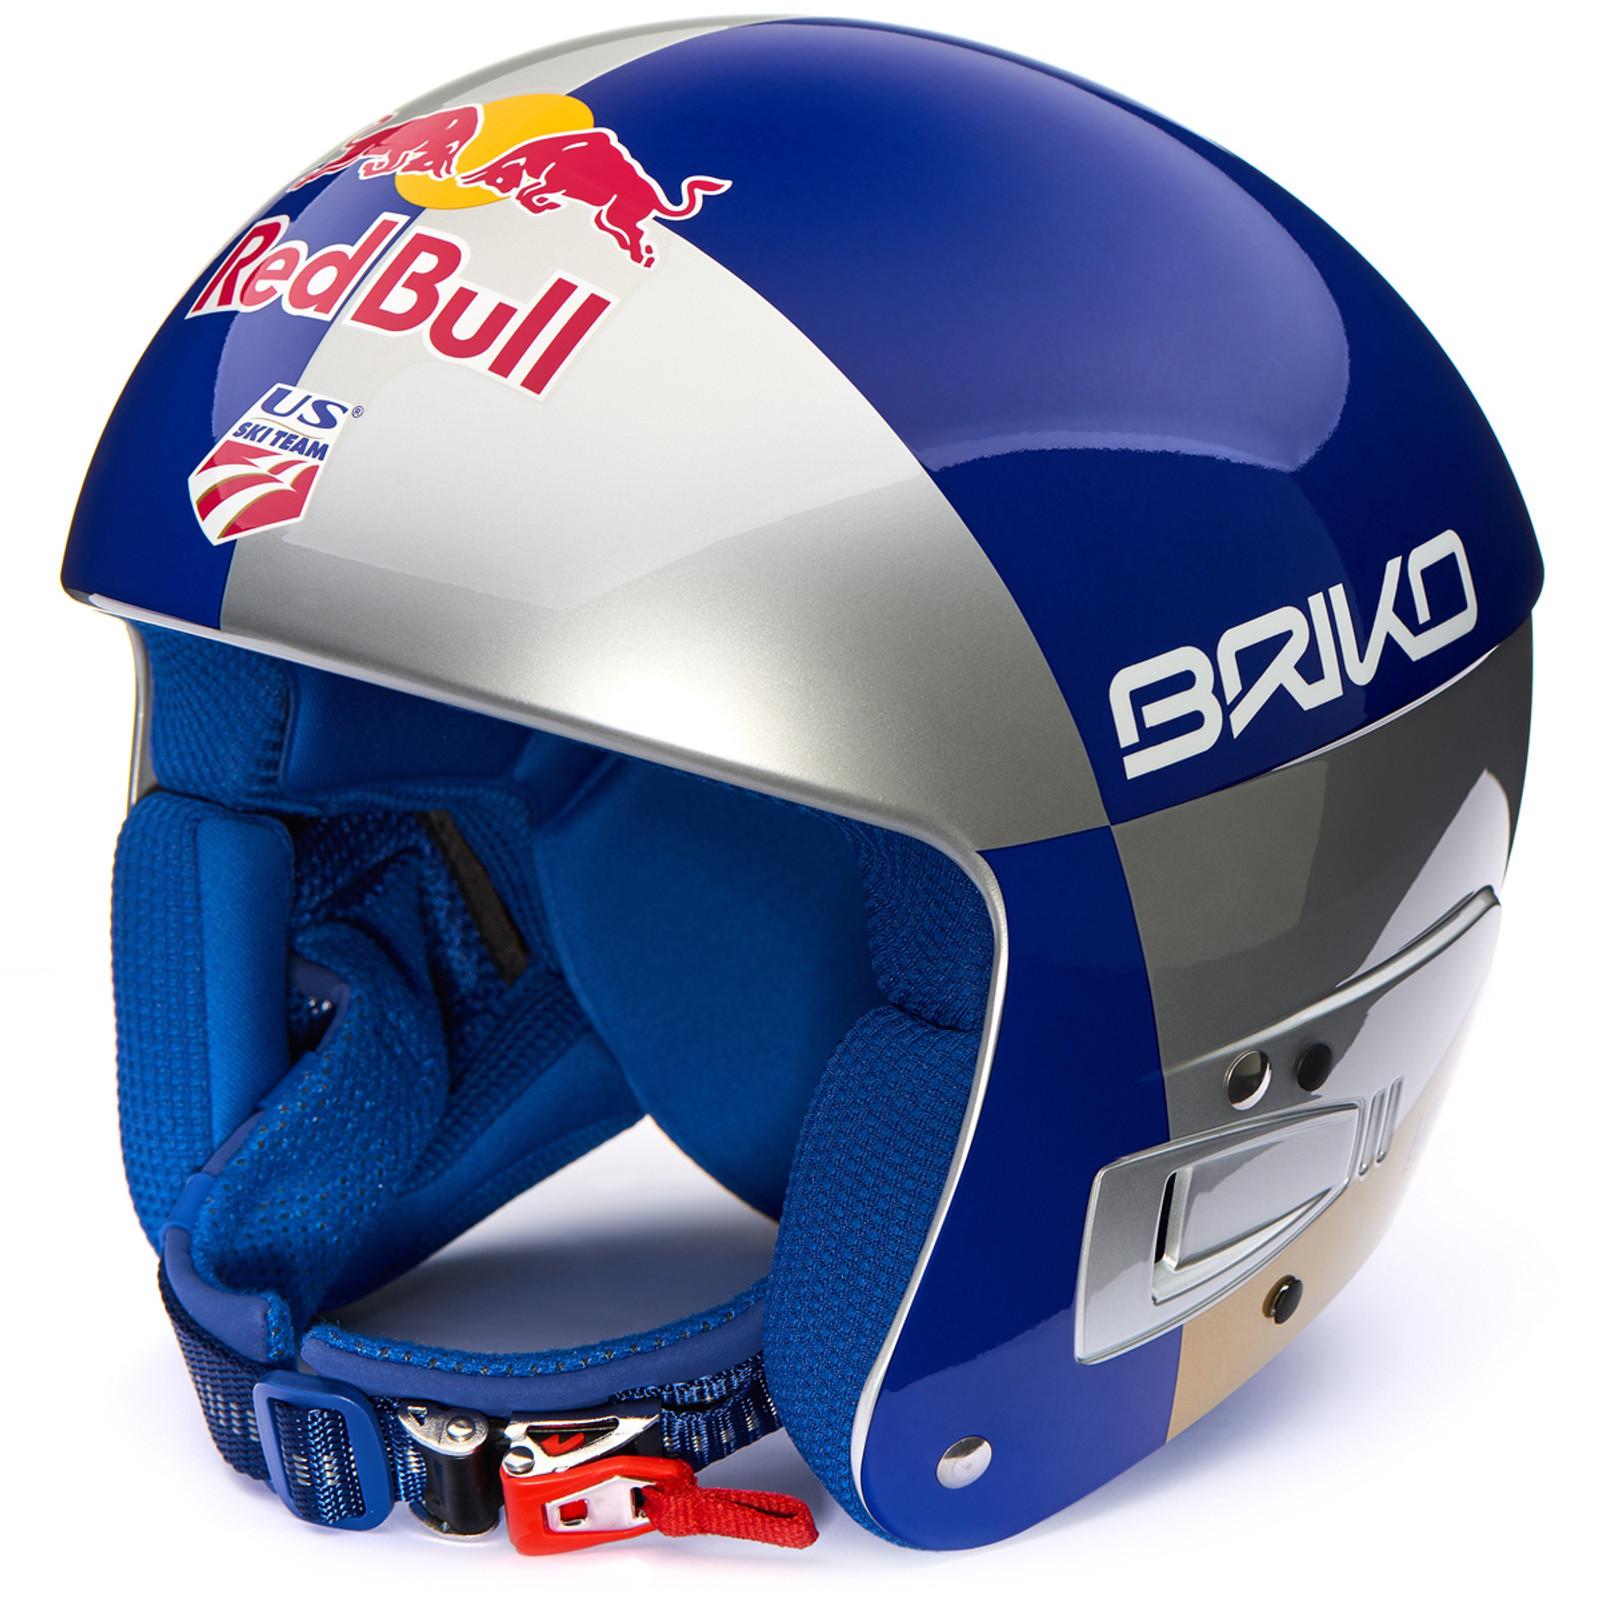 Briko Fluid Lindsey Vonn Red Bull Helmet